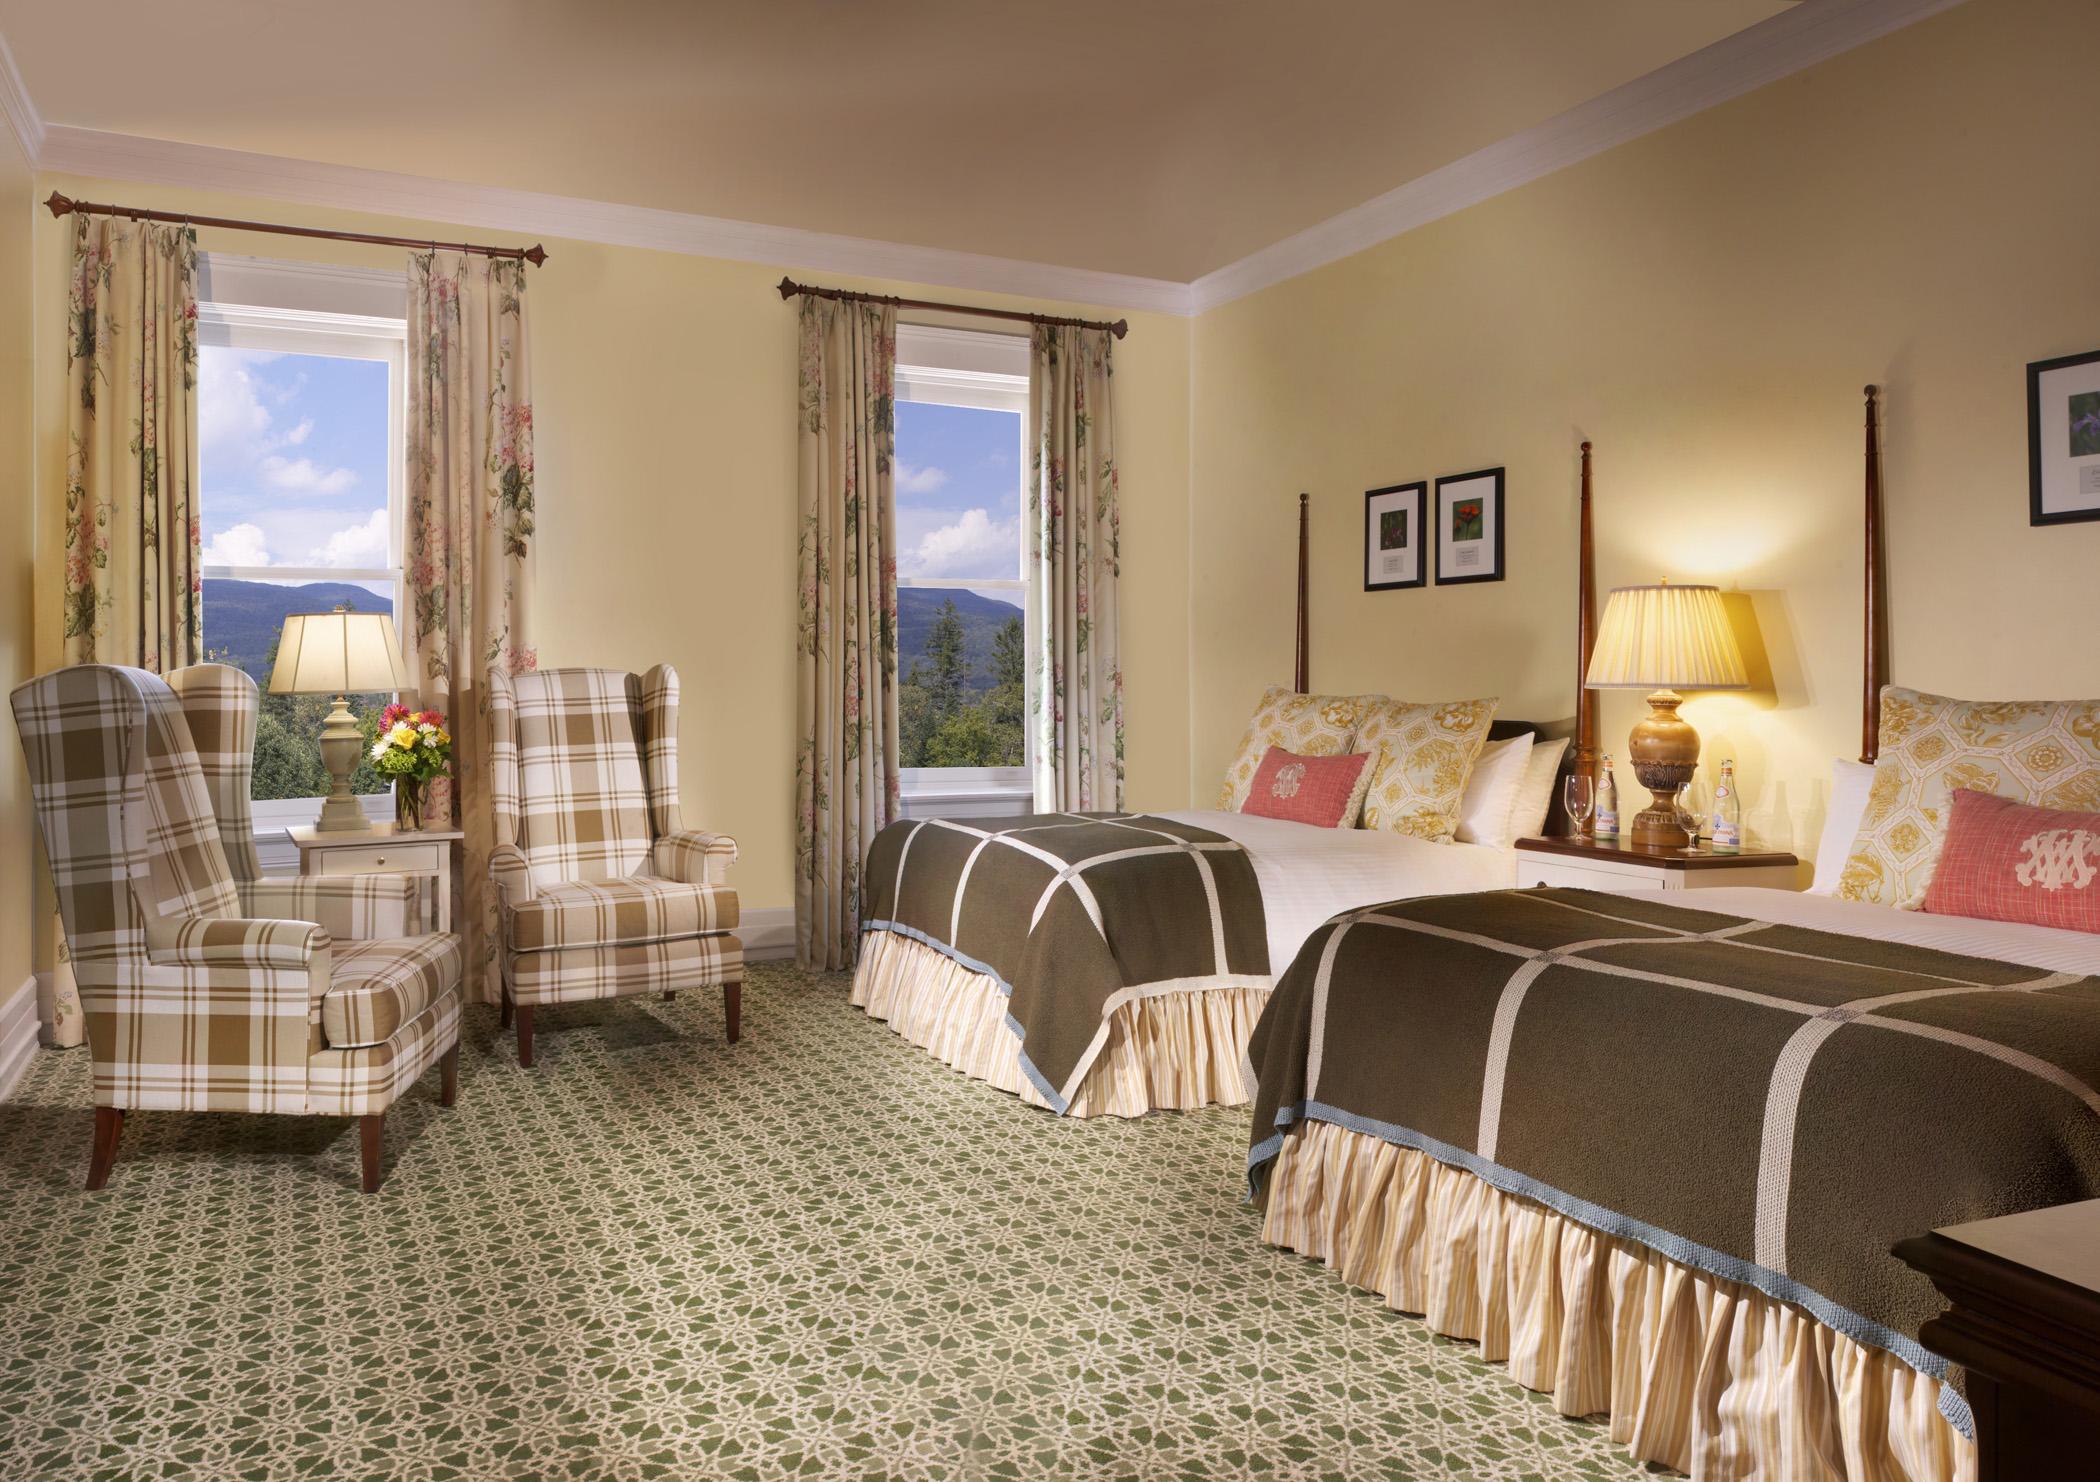 Room at the Mt. Washington Hotel